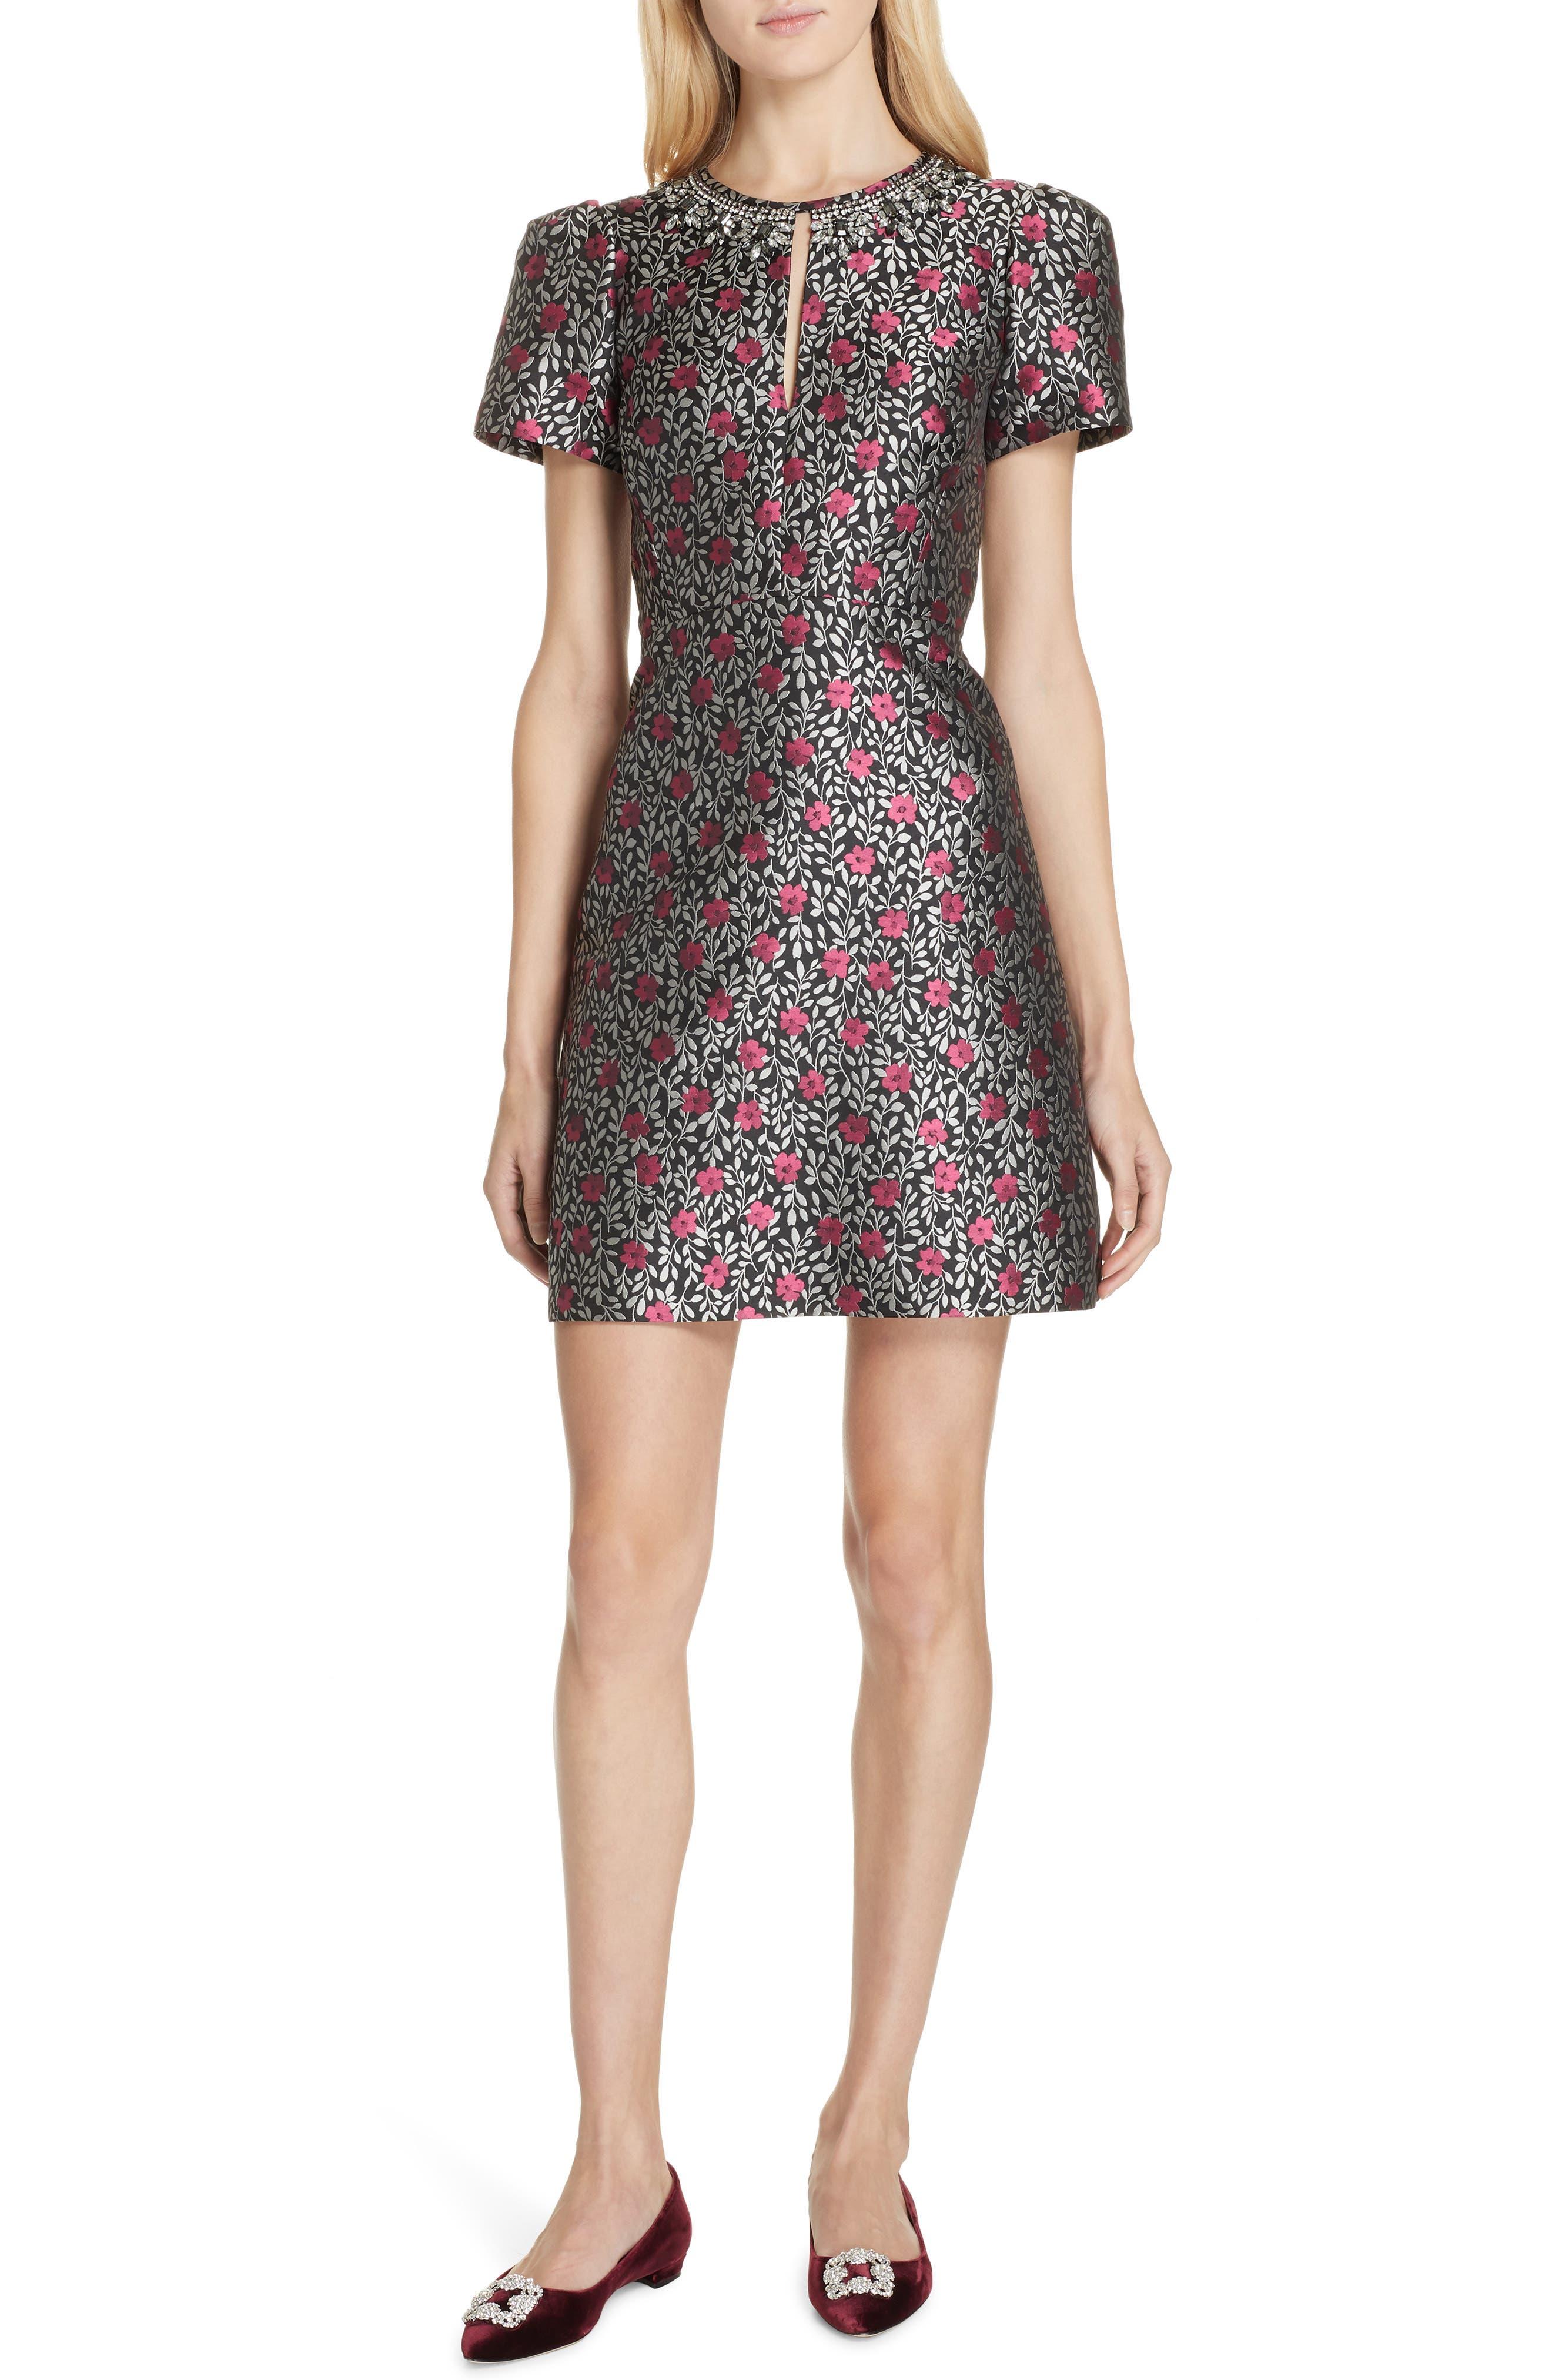 Kate Spade New York Floral Park Jacquard Fit & Flare Dress, Black